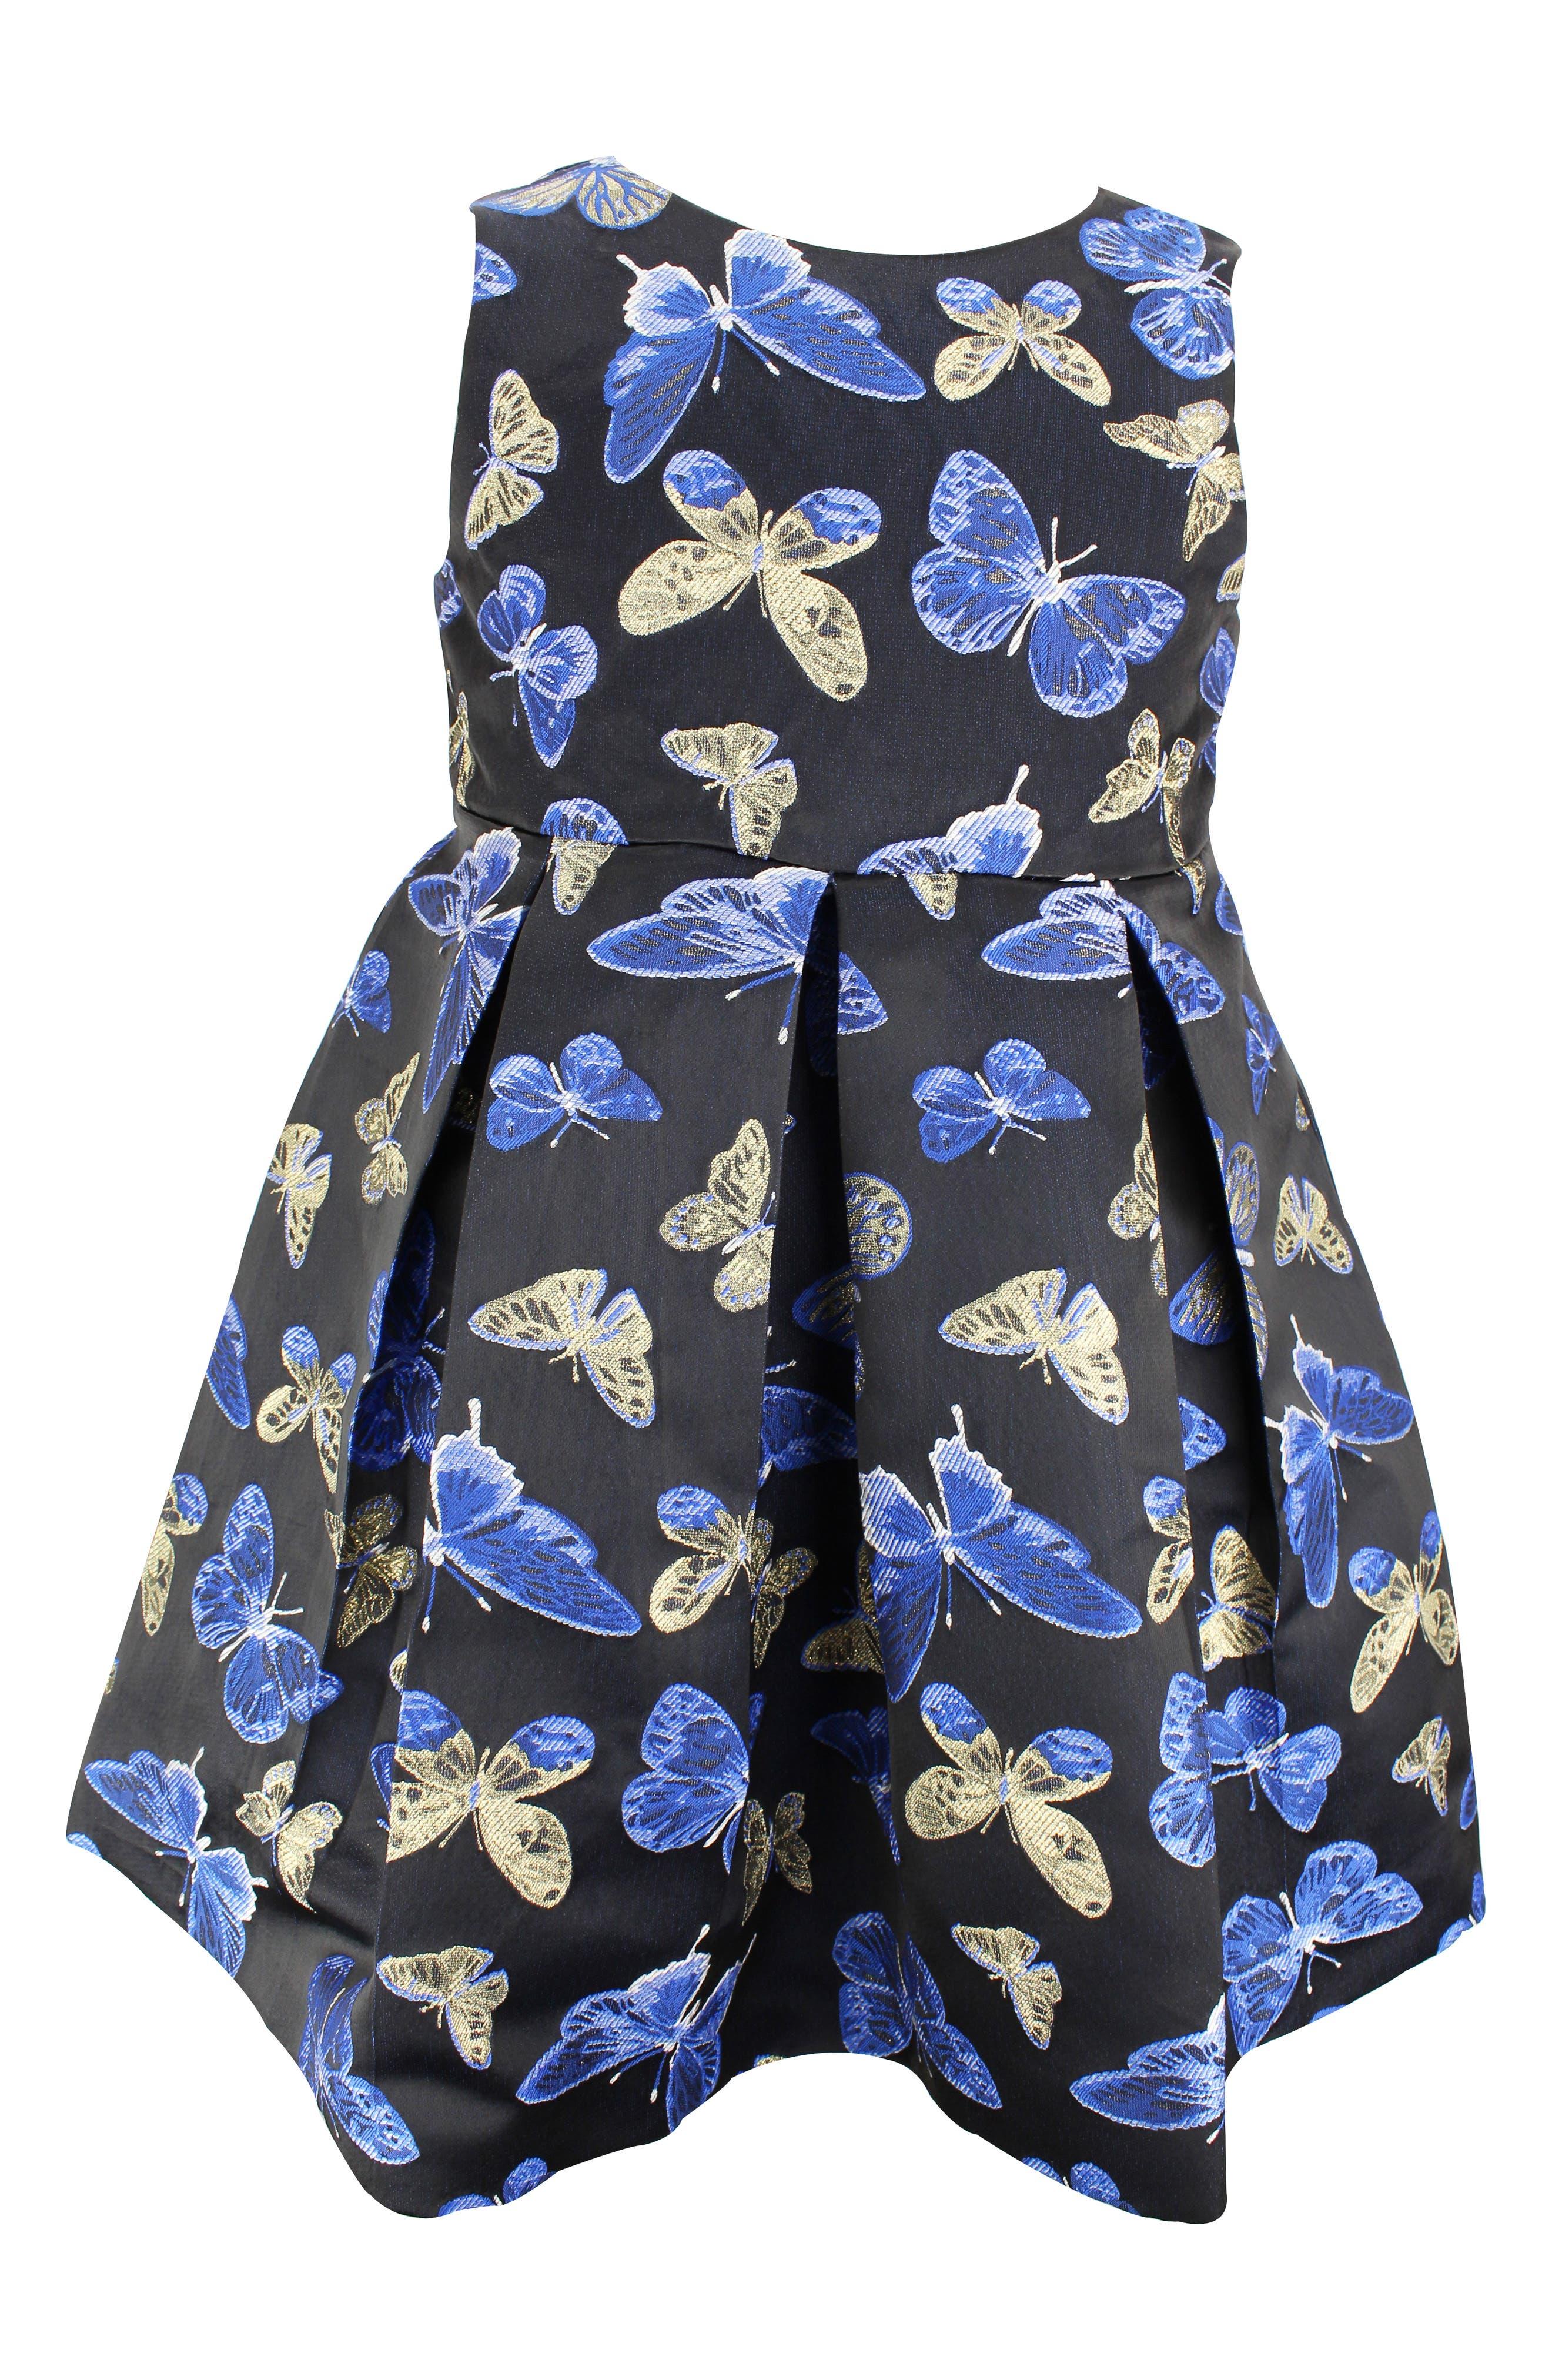 Image of Popatu Butterfly Pleated Skirt Dress